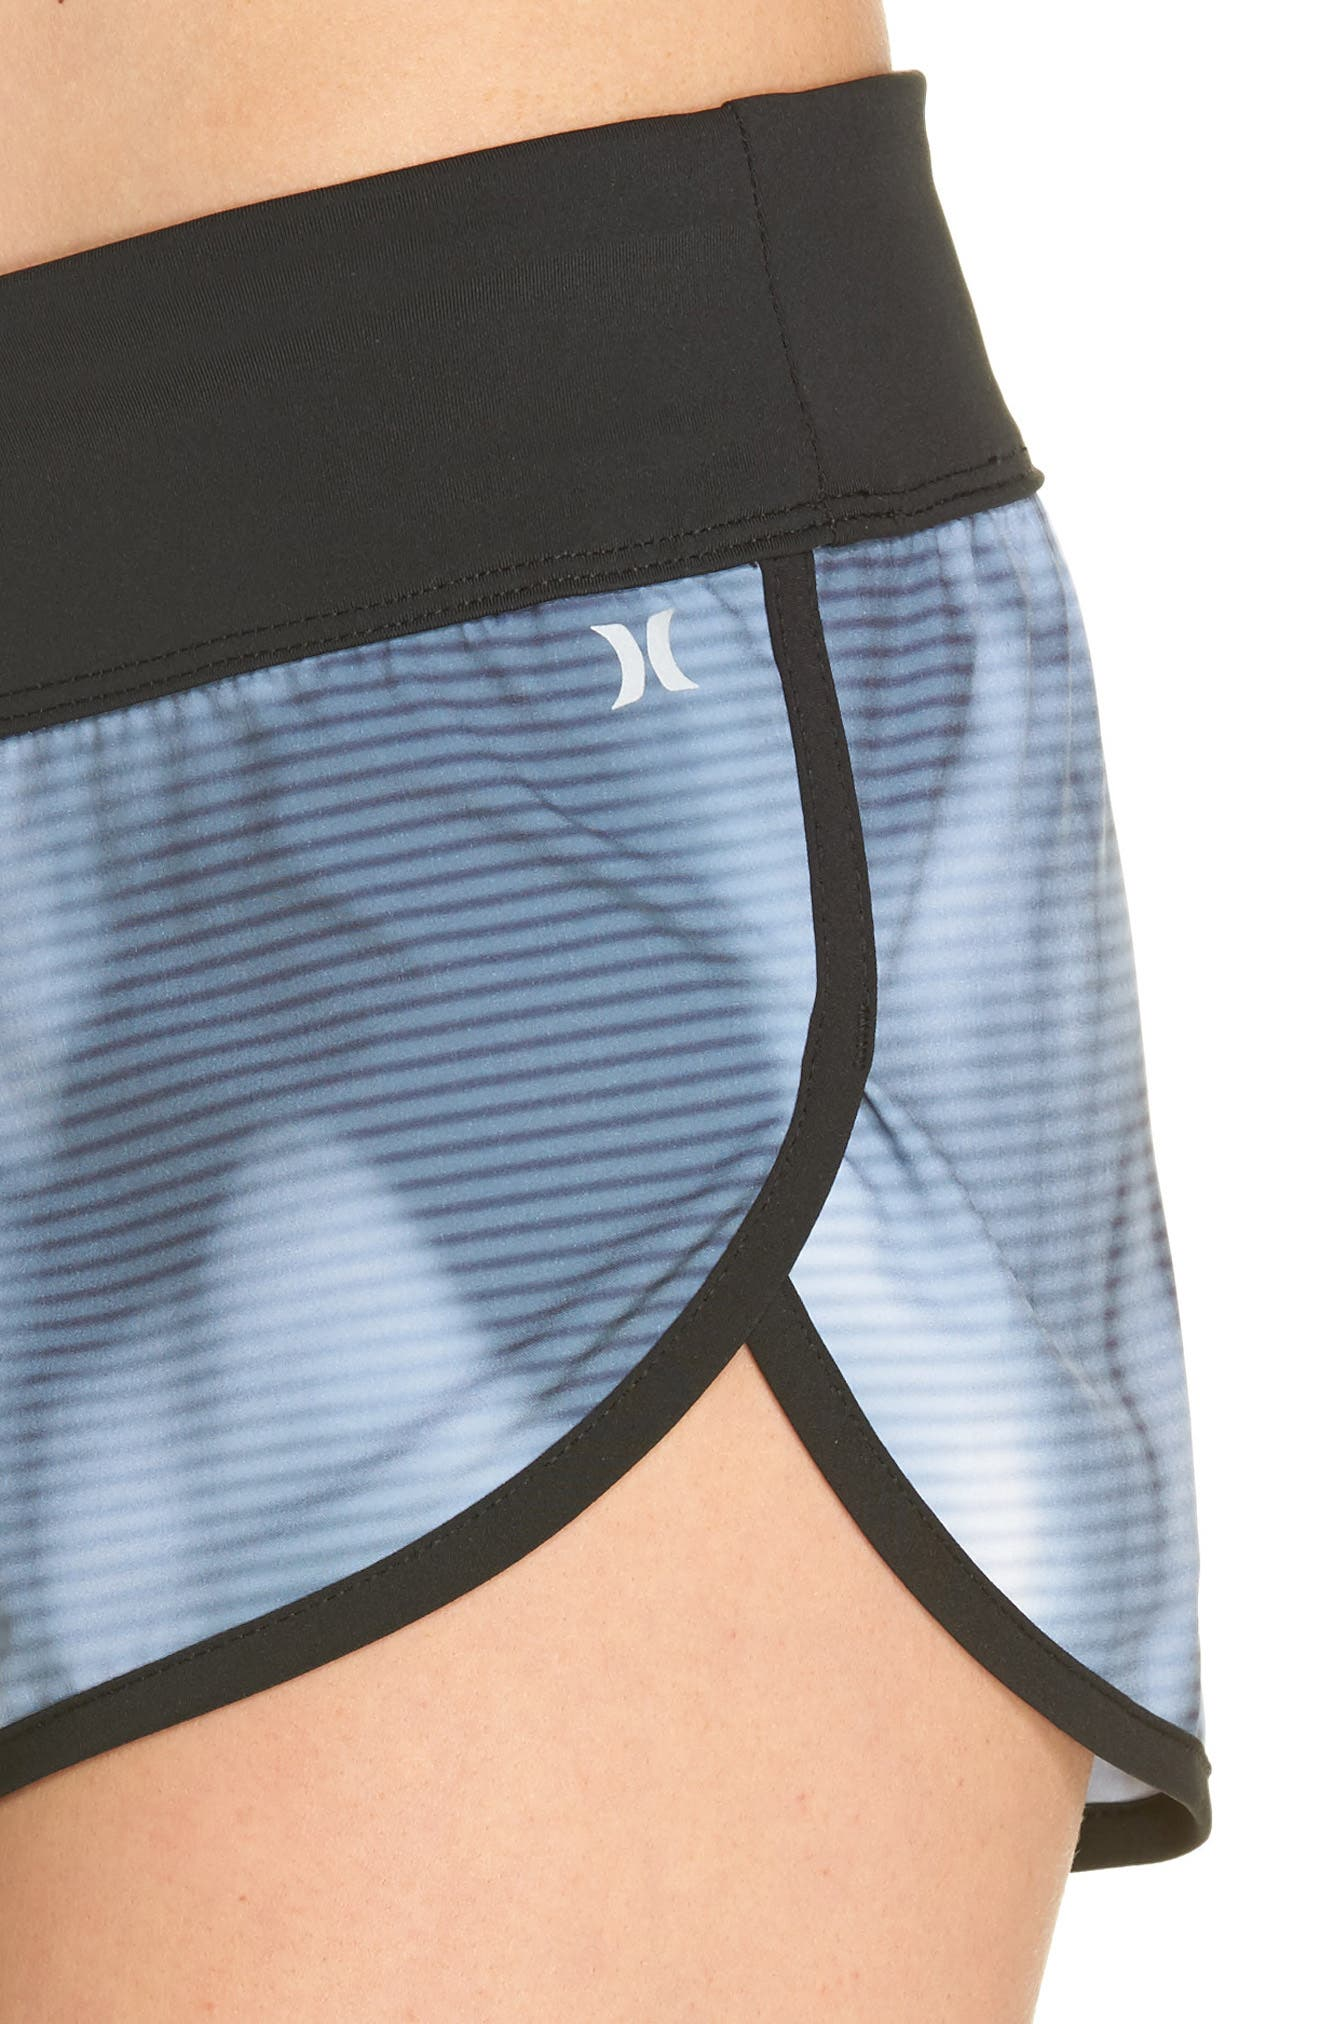 Phantom Waves Beachrider Shorts,                             Alternate thumbnail 4, color,                             401